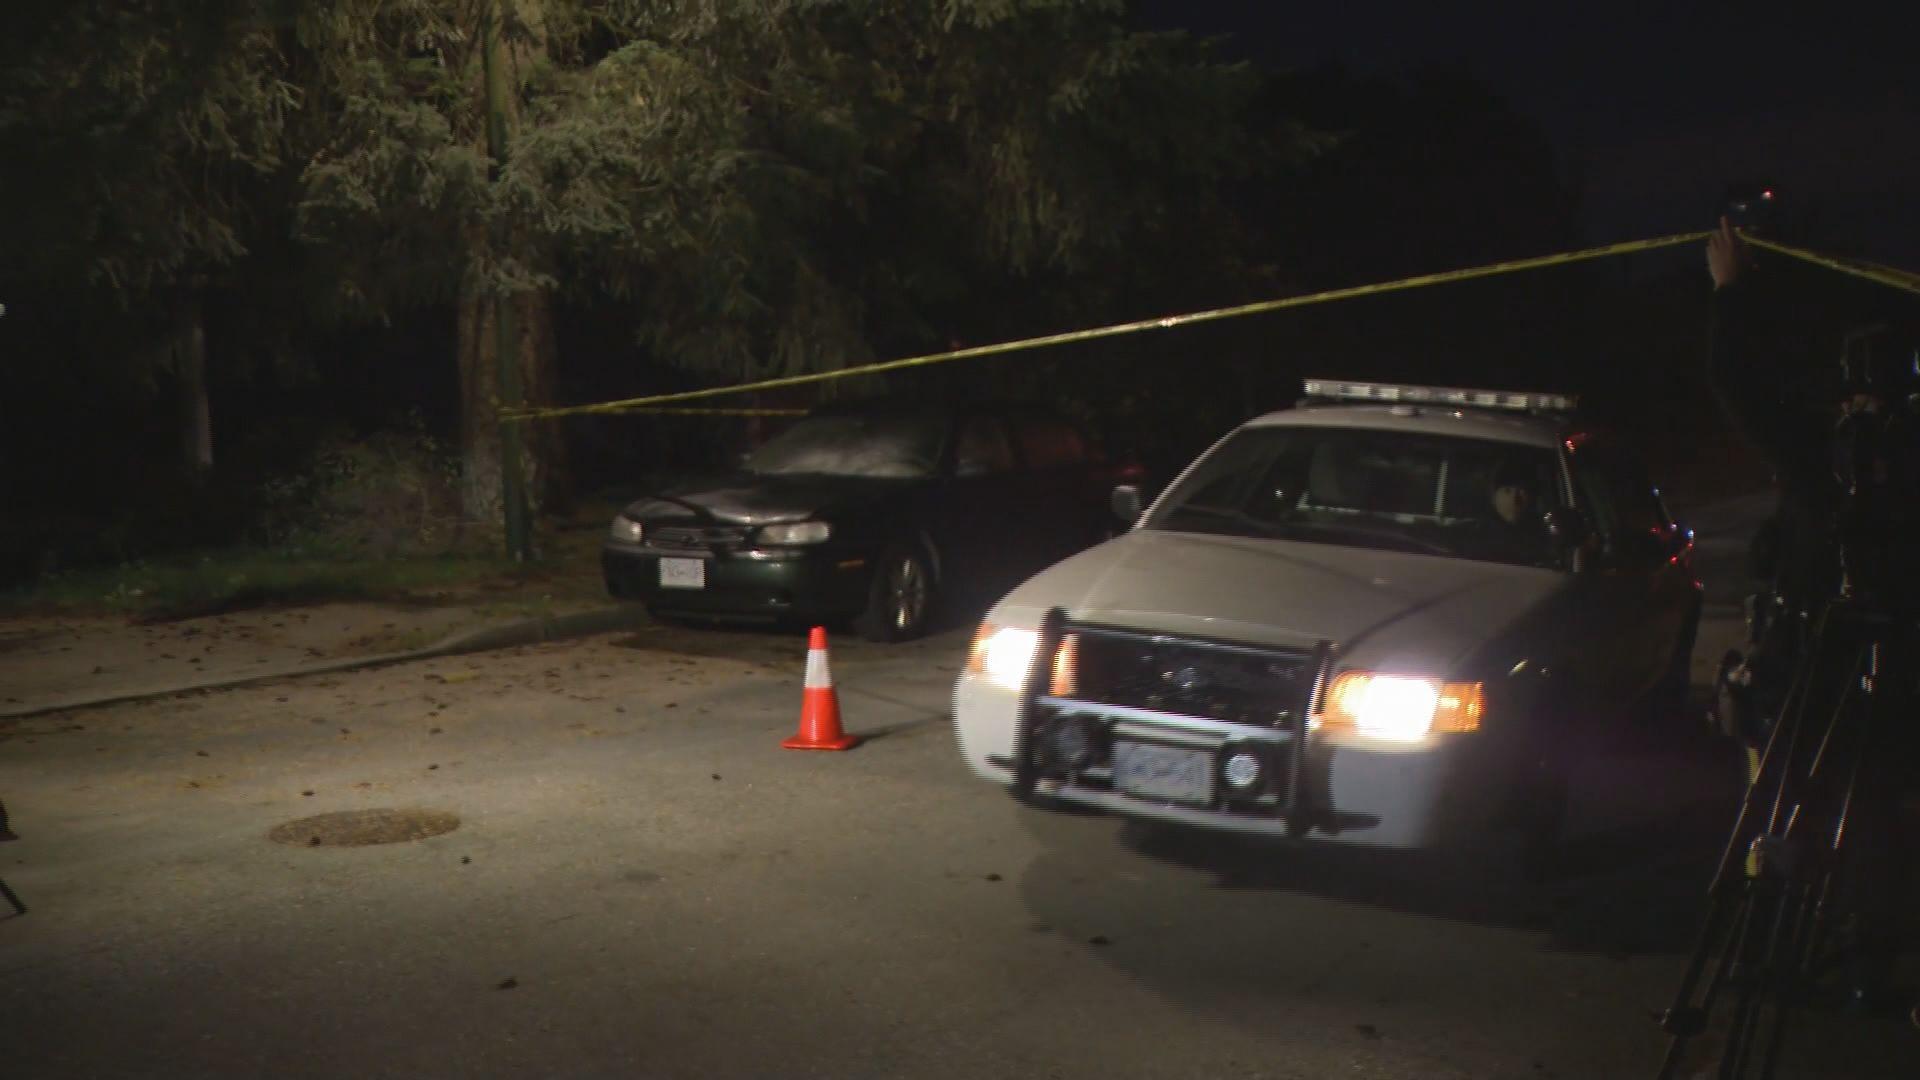 Homicide investigators deployed to Coquitlam home